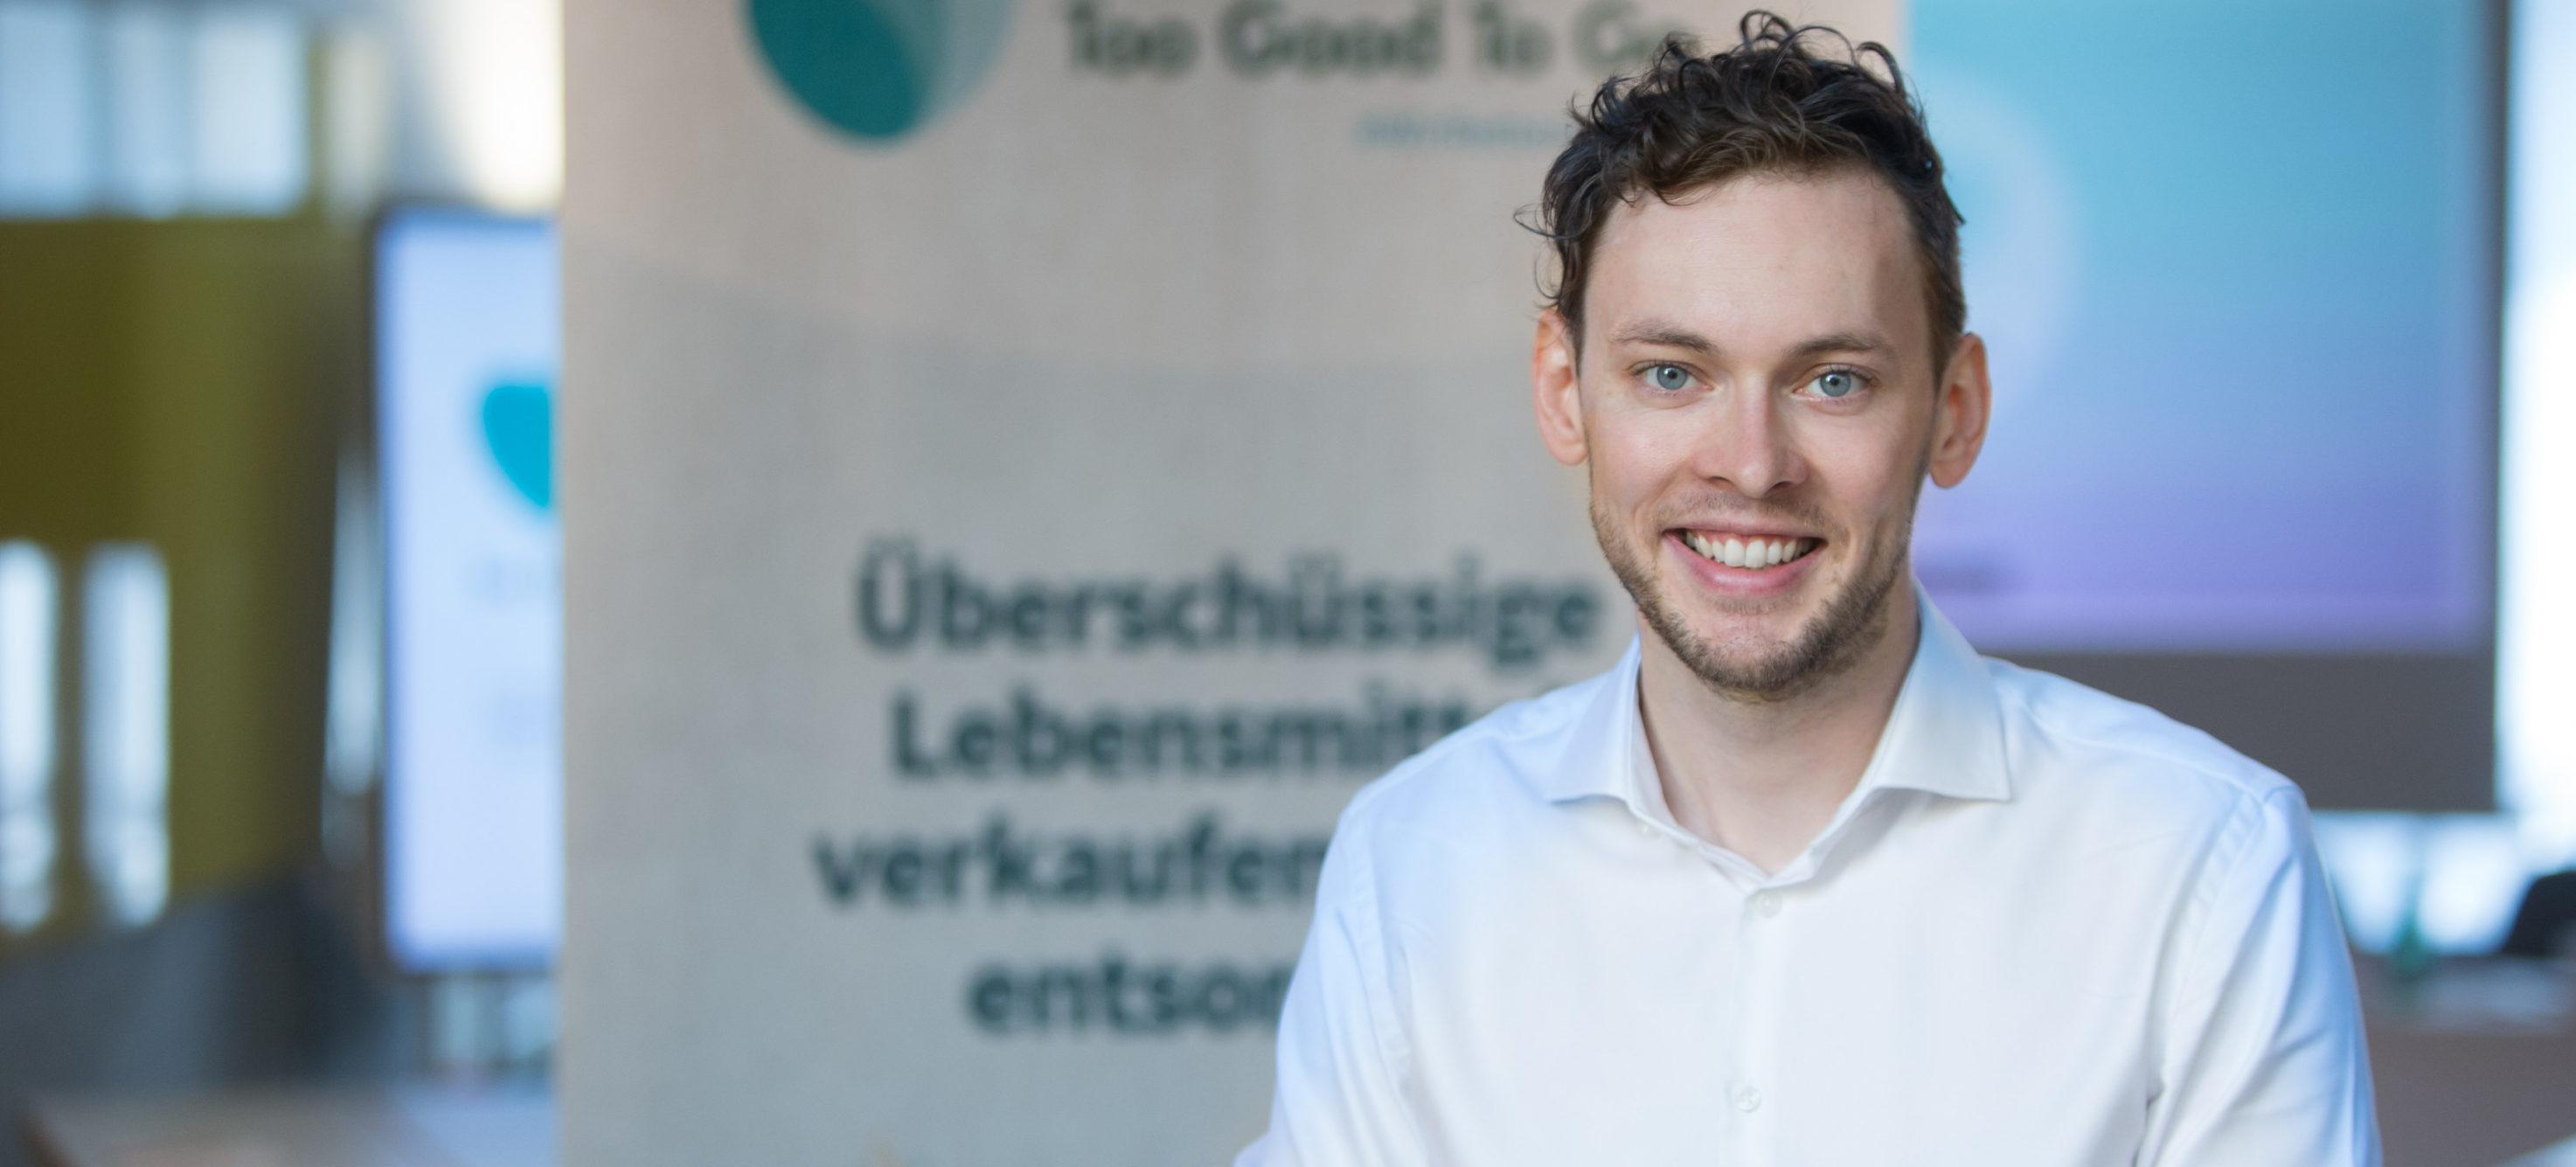 Too good to go, App, Lebensmittelverschwendung, Wien, Linz, Georg Strasser